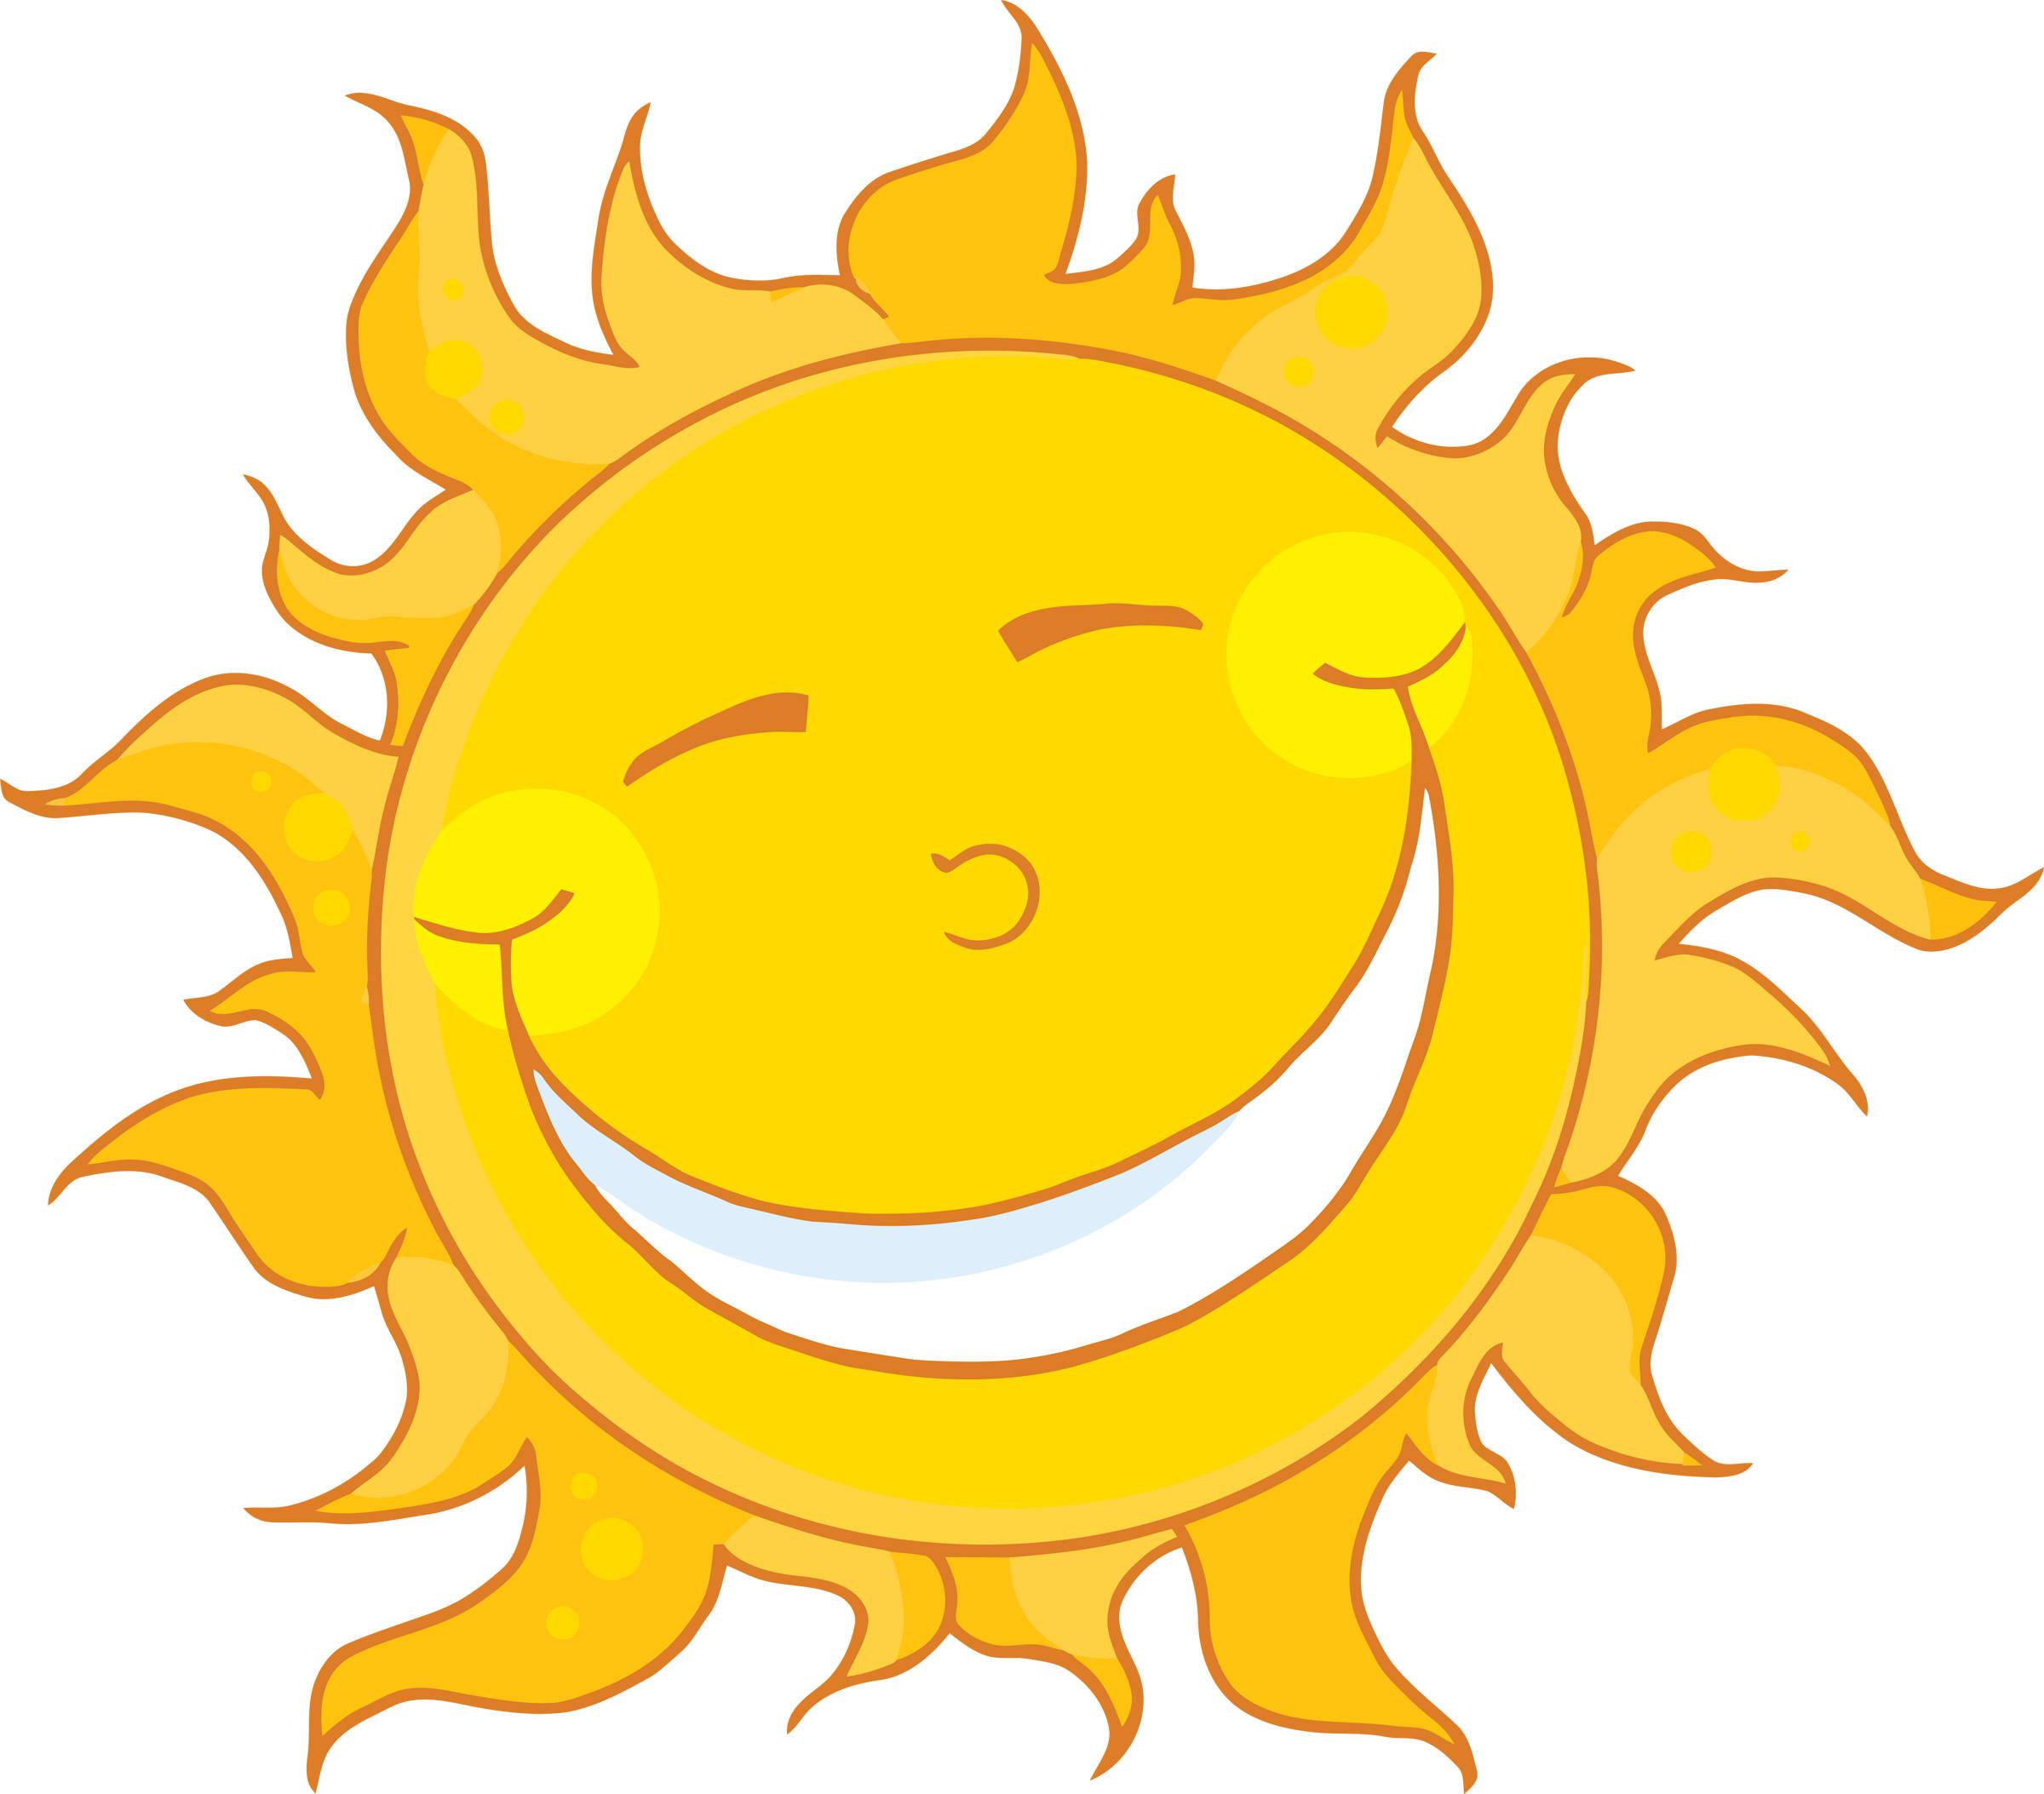 2400x2107 Sunshine Smiling Sun Face Clipart Image